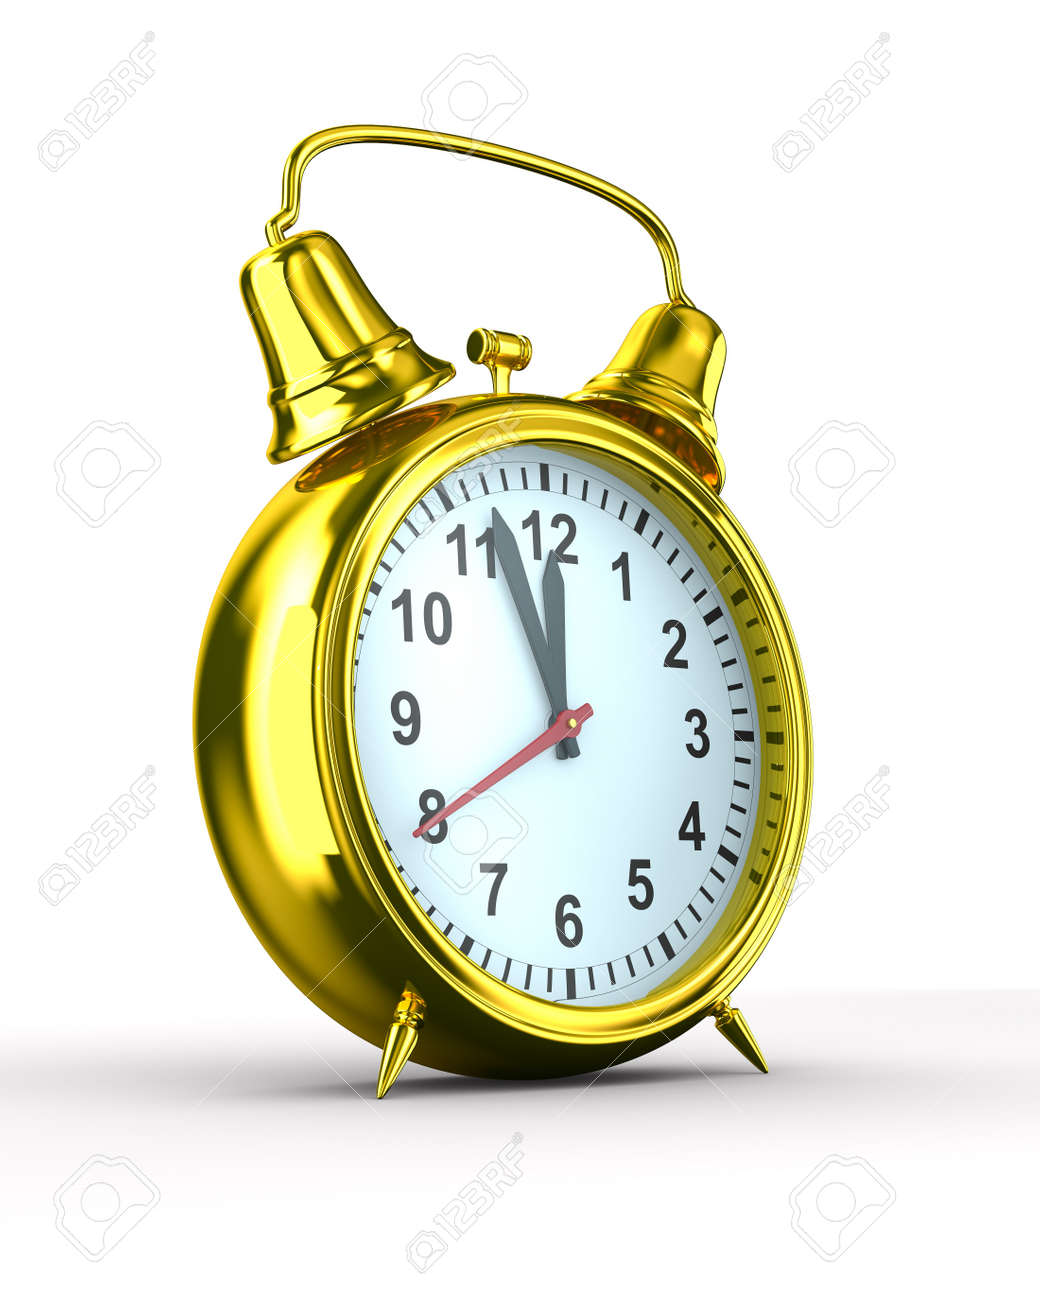 Alarm clock on white background. Isolated 3D image Stock Photo - 7988700